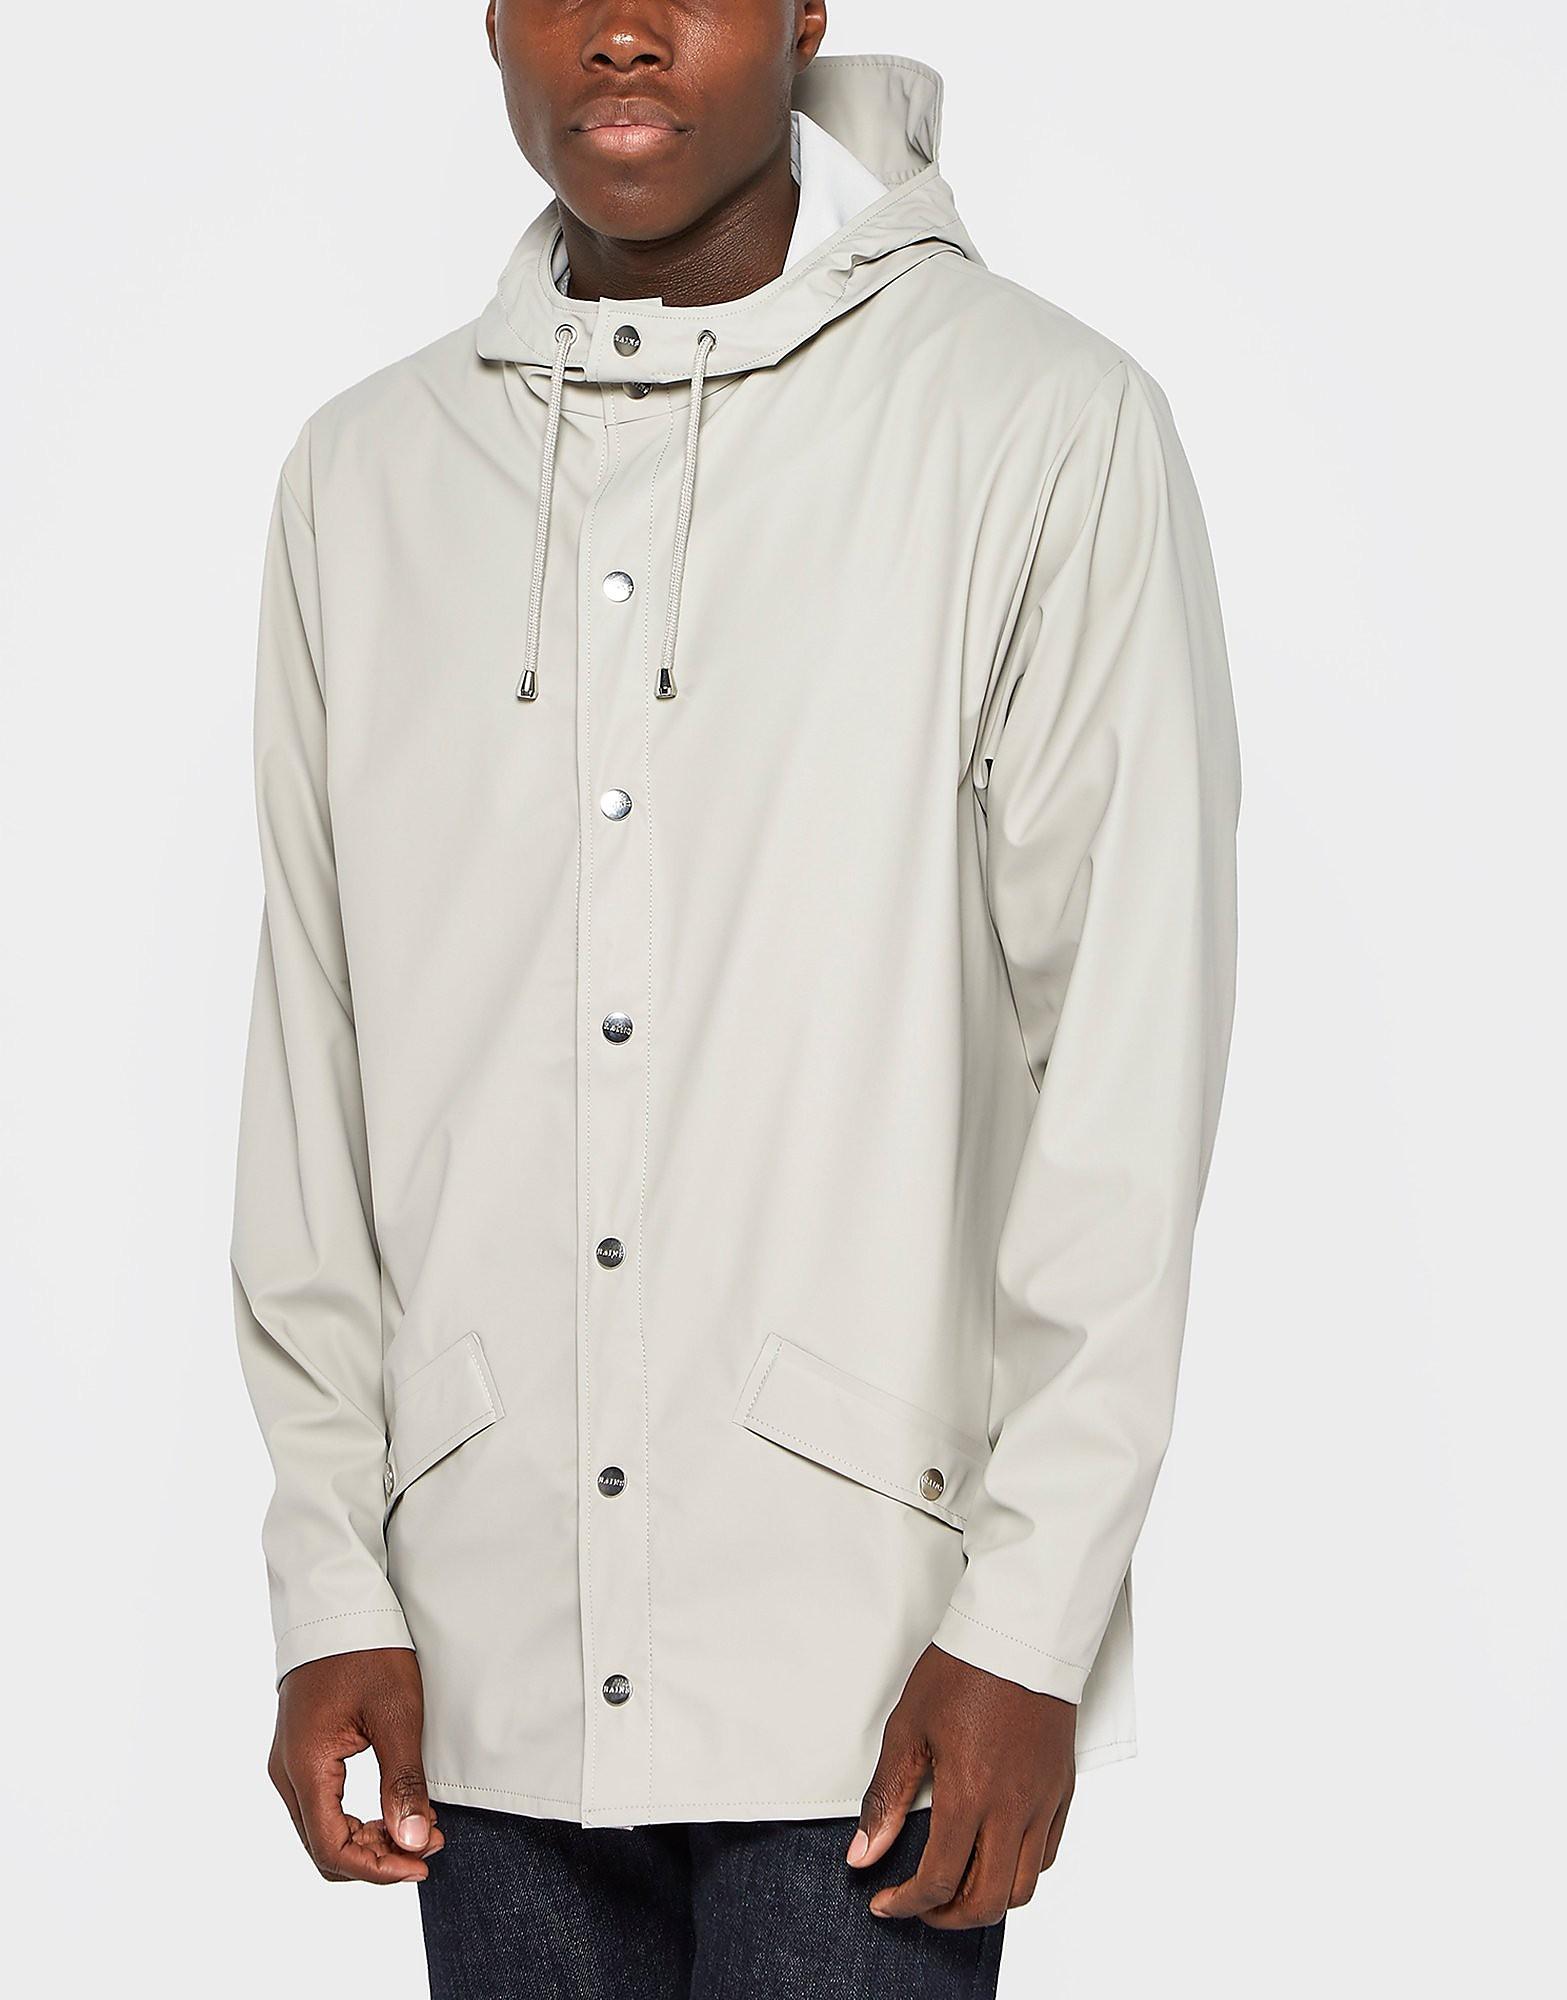 RAINS Lightweight Jacket